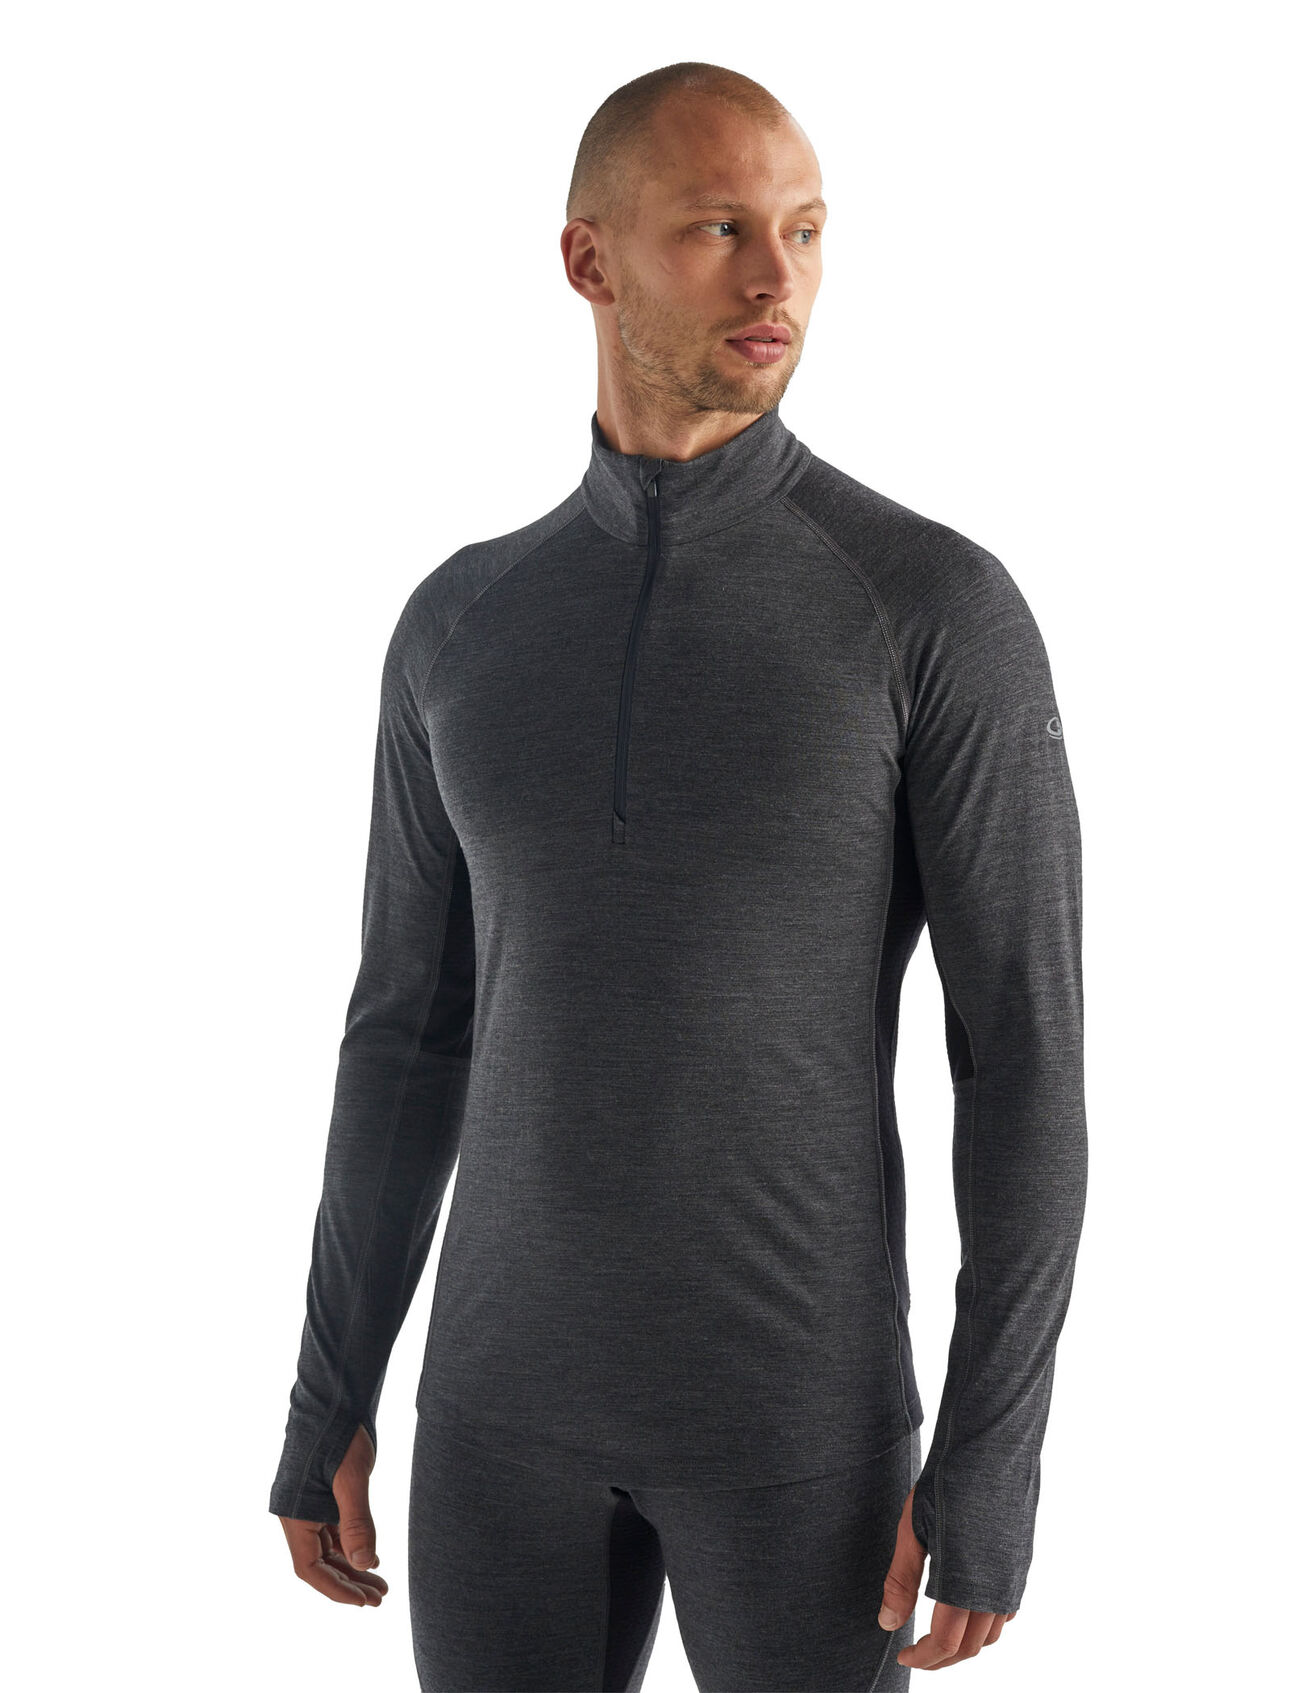 BodyFitZone™ 260 Zone长袖半拉链上衣